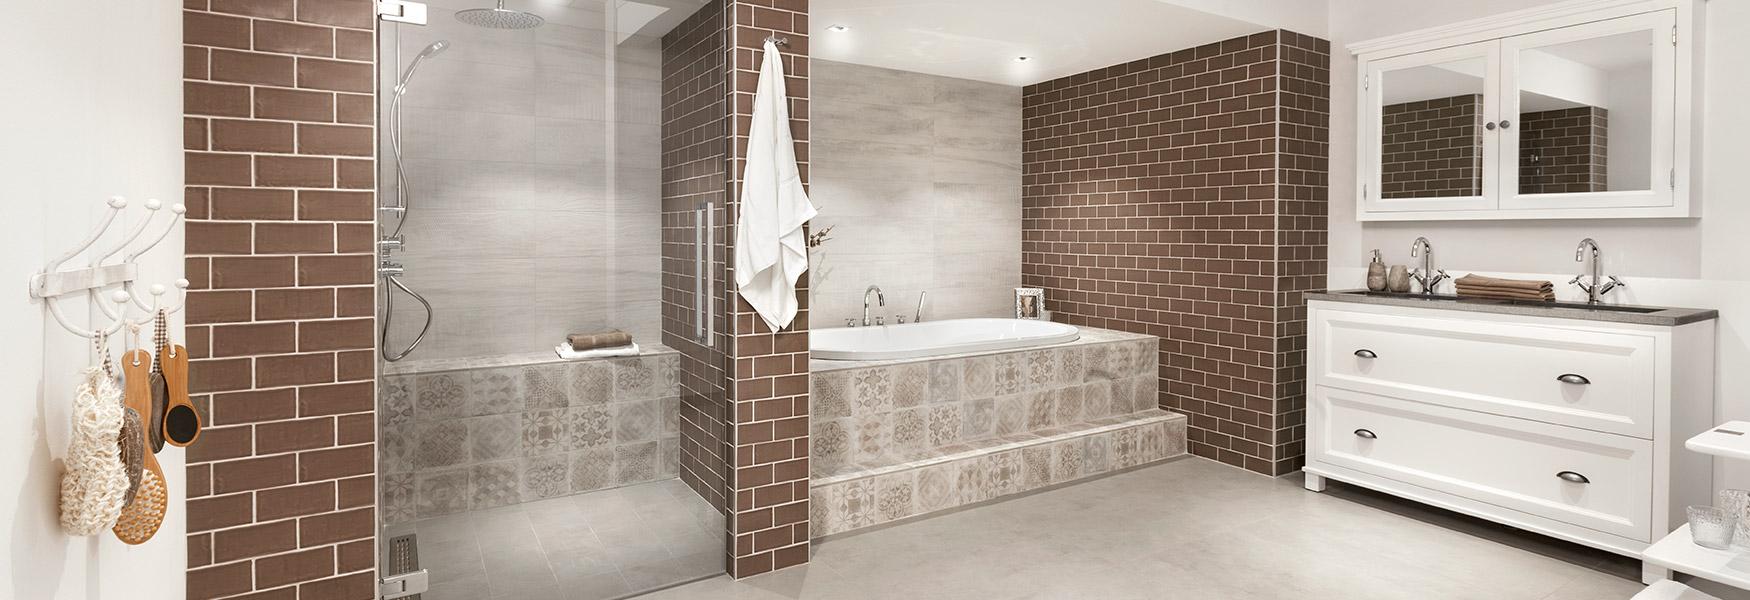 olivia badkamer | brugman badkamers, Badkamer